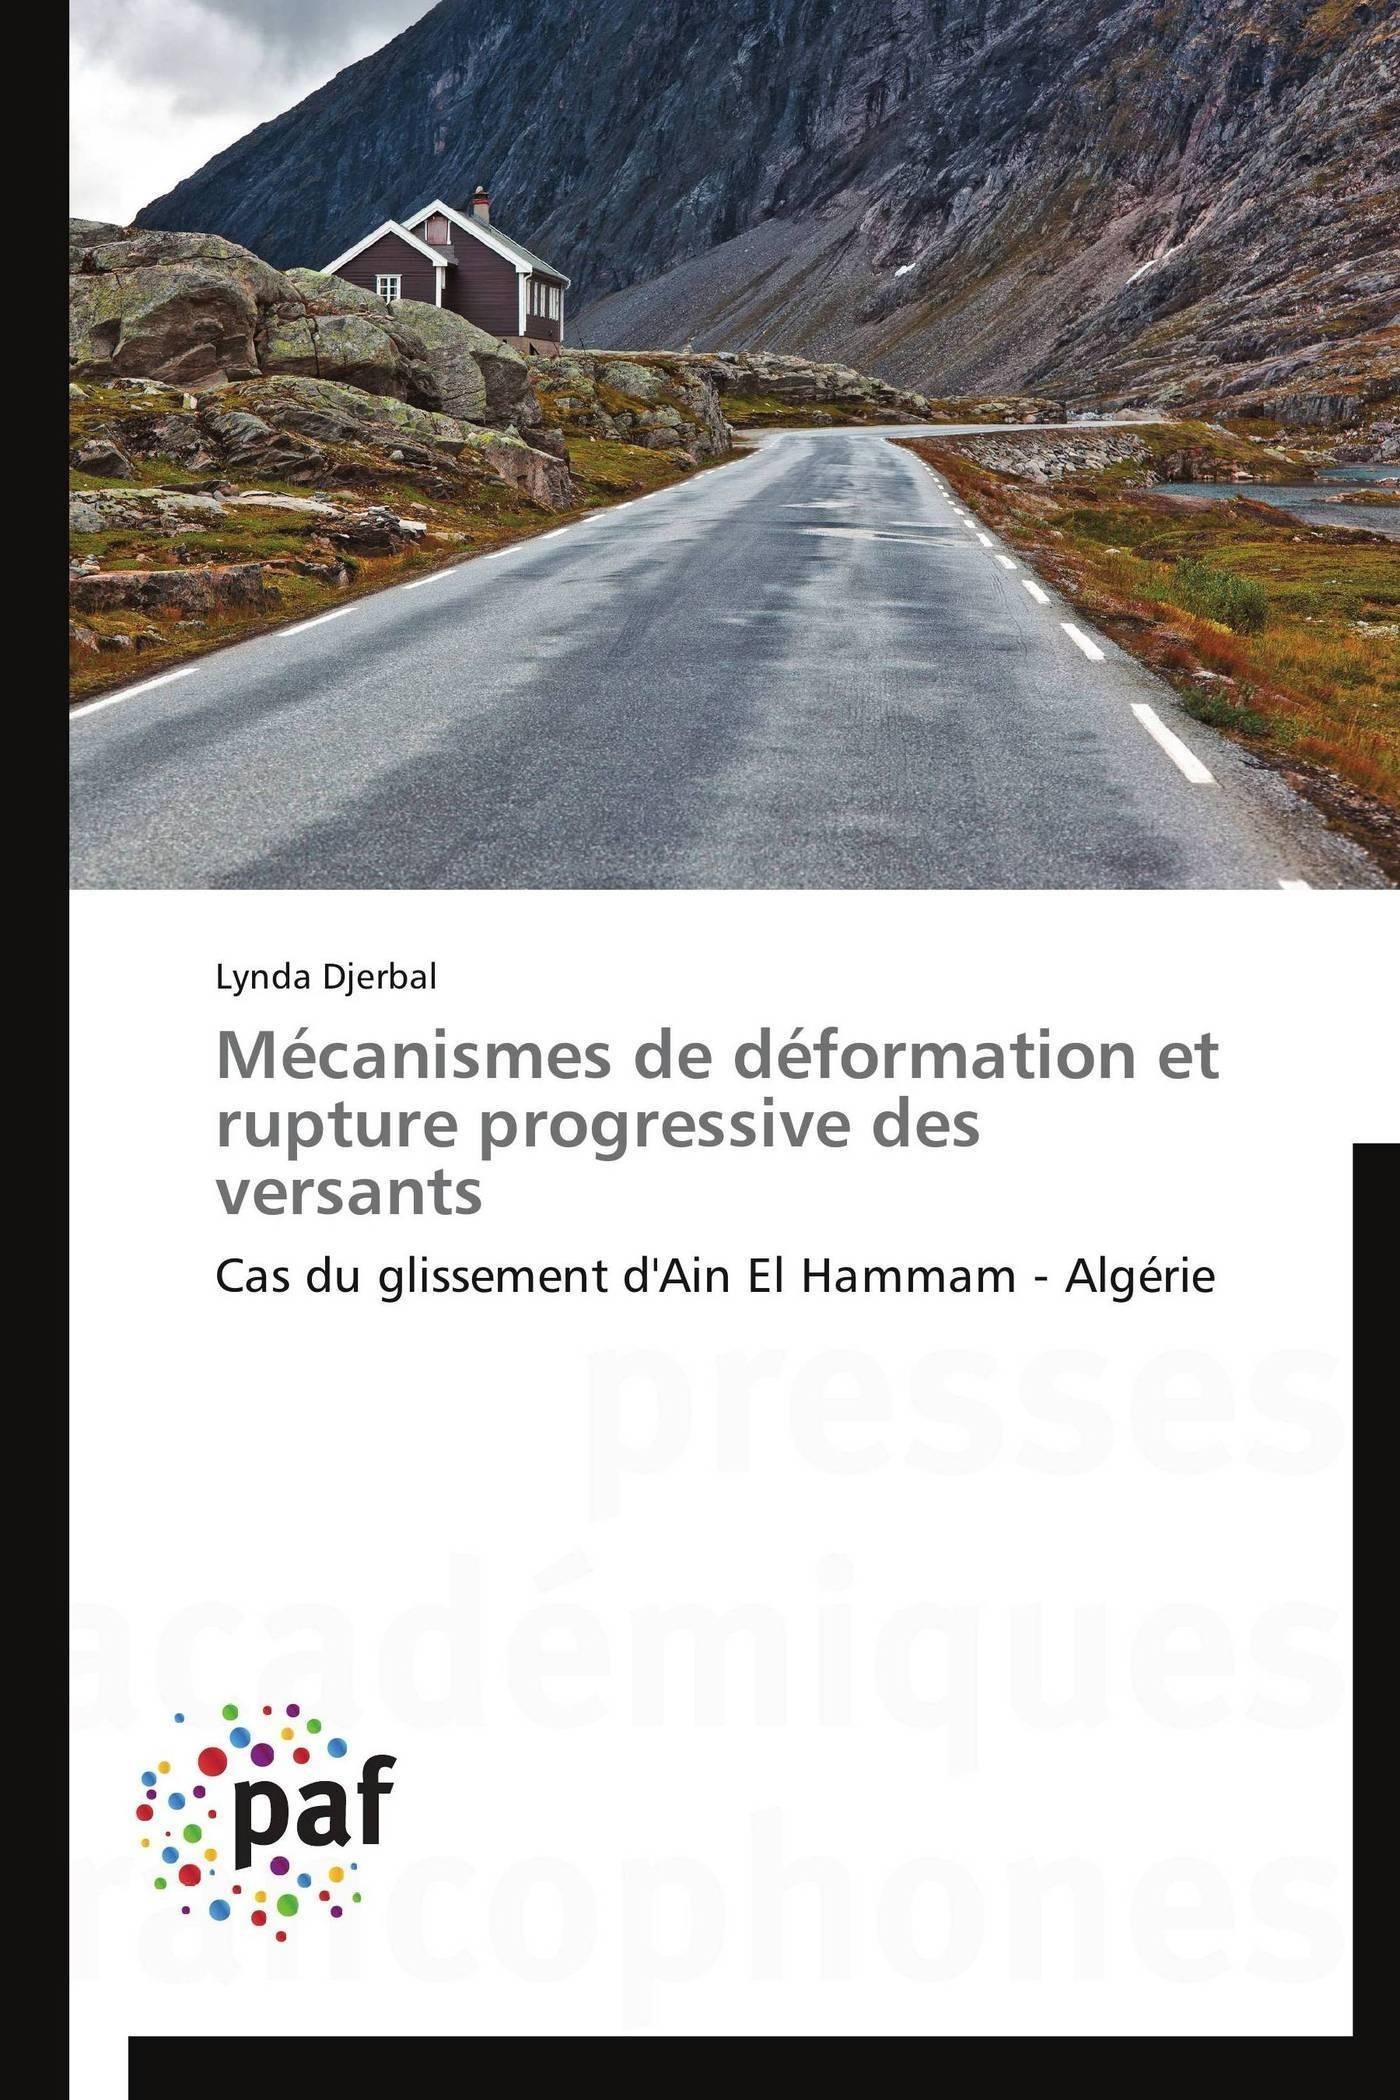 MECANISMES DE DEFORMATION ET RUPTURE PROGRESSIVE DES VERSANTS